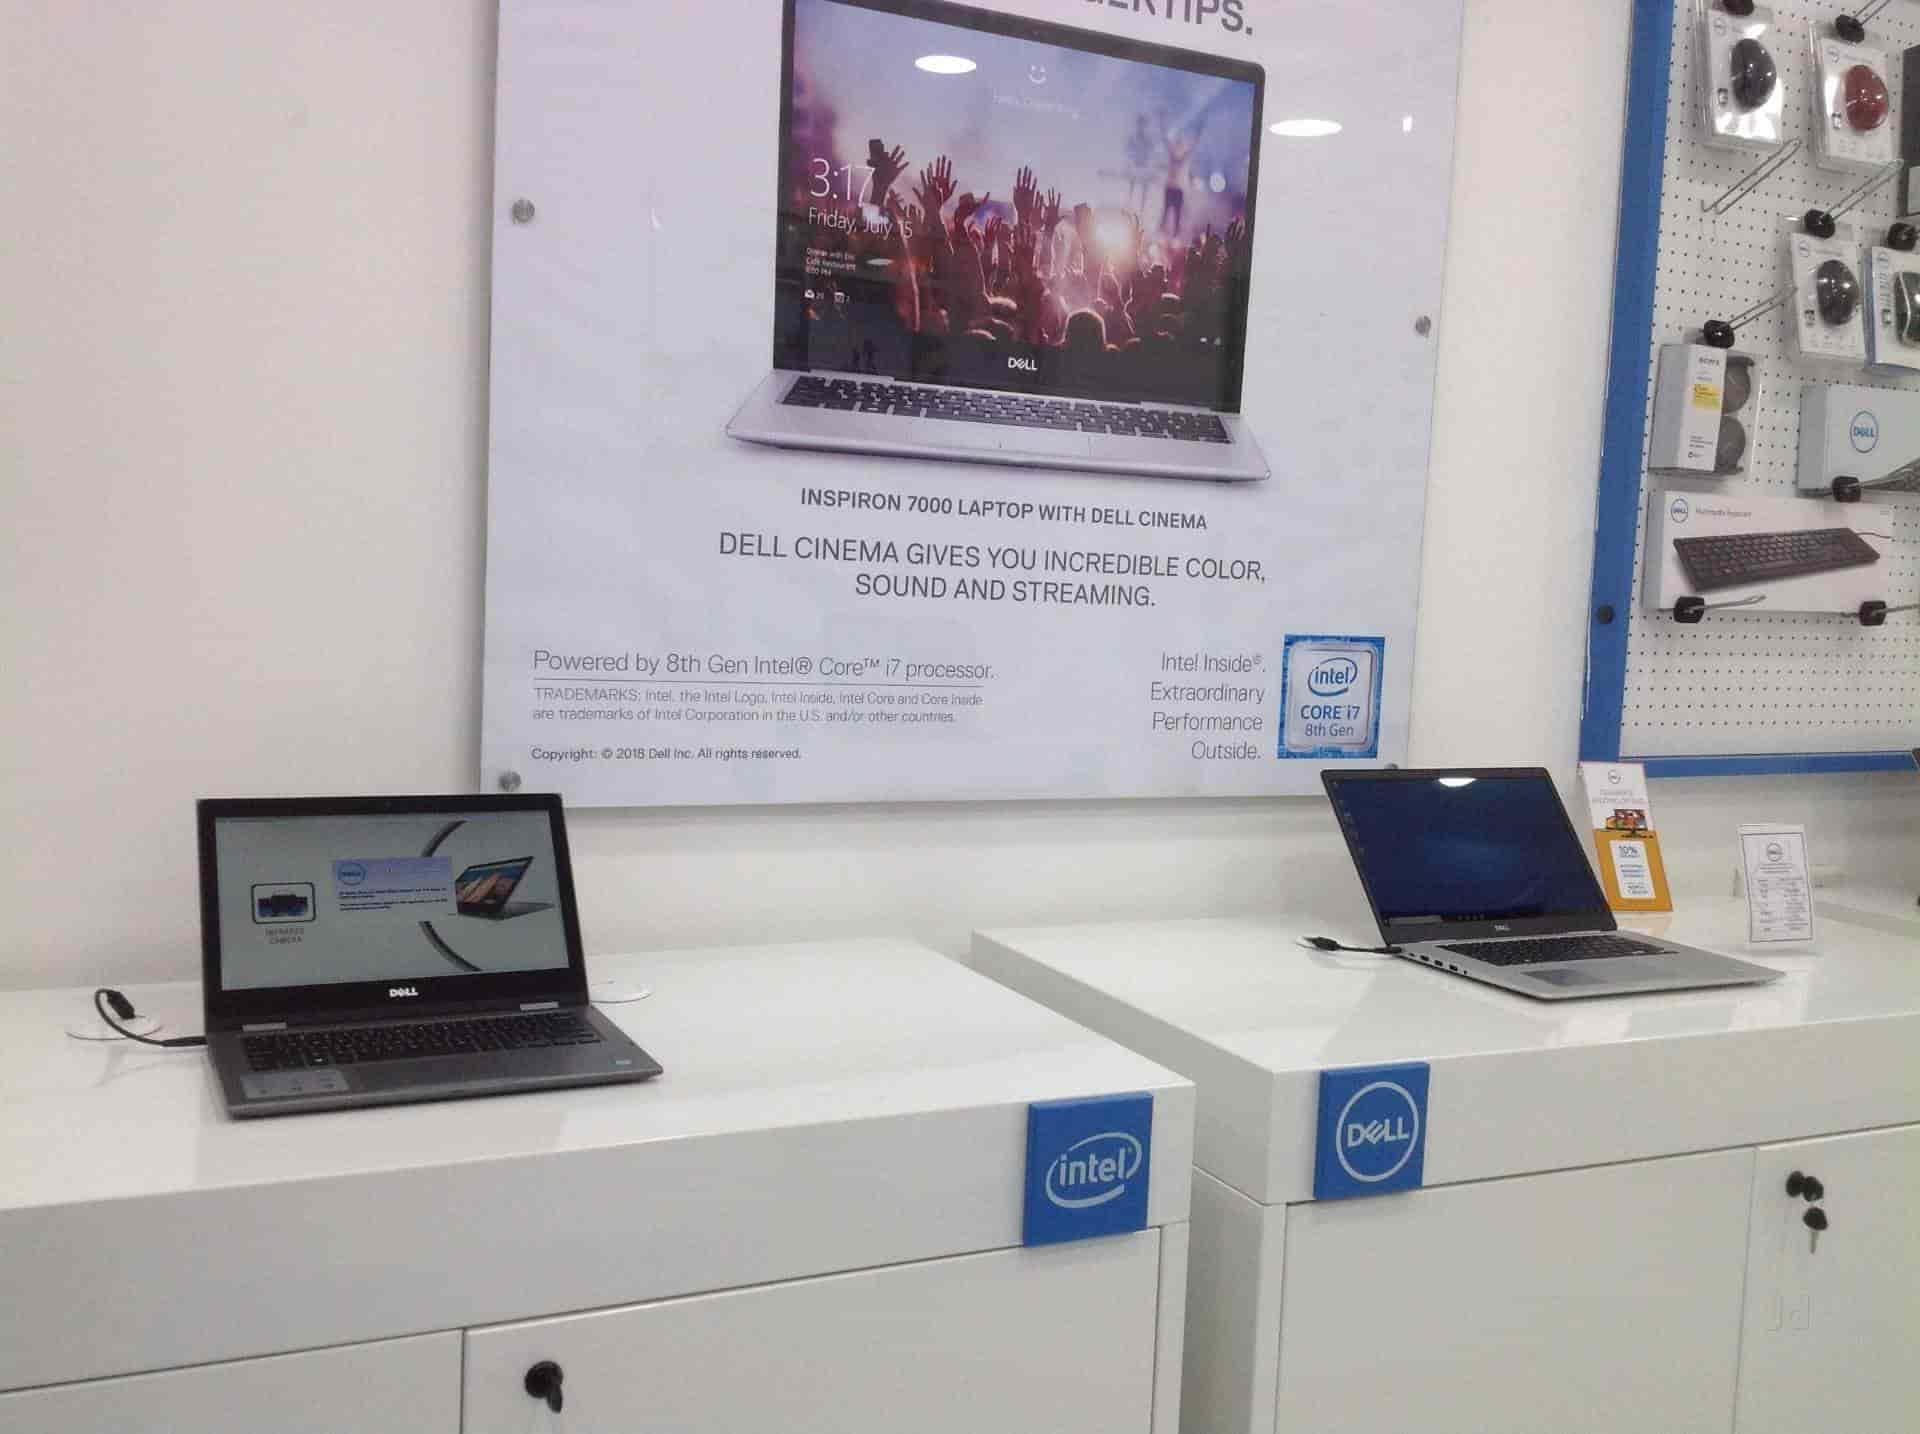 Dell Cinema Laptop